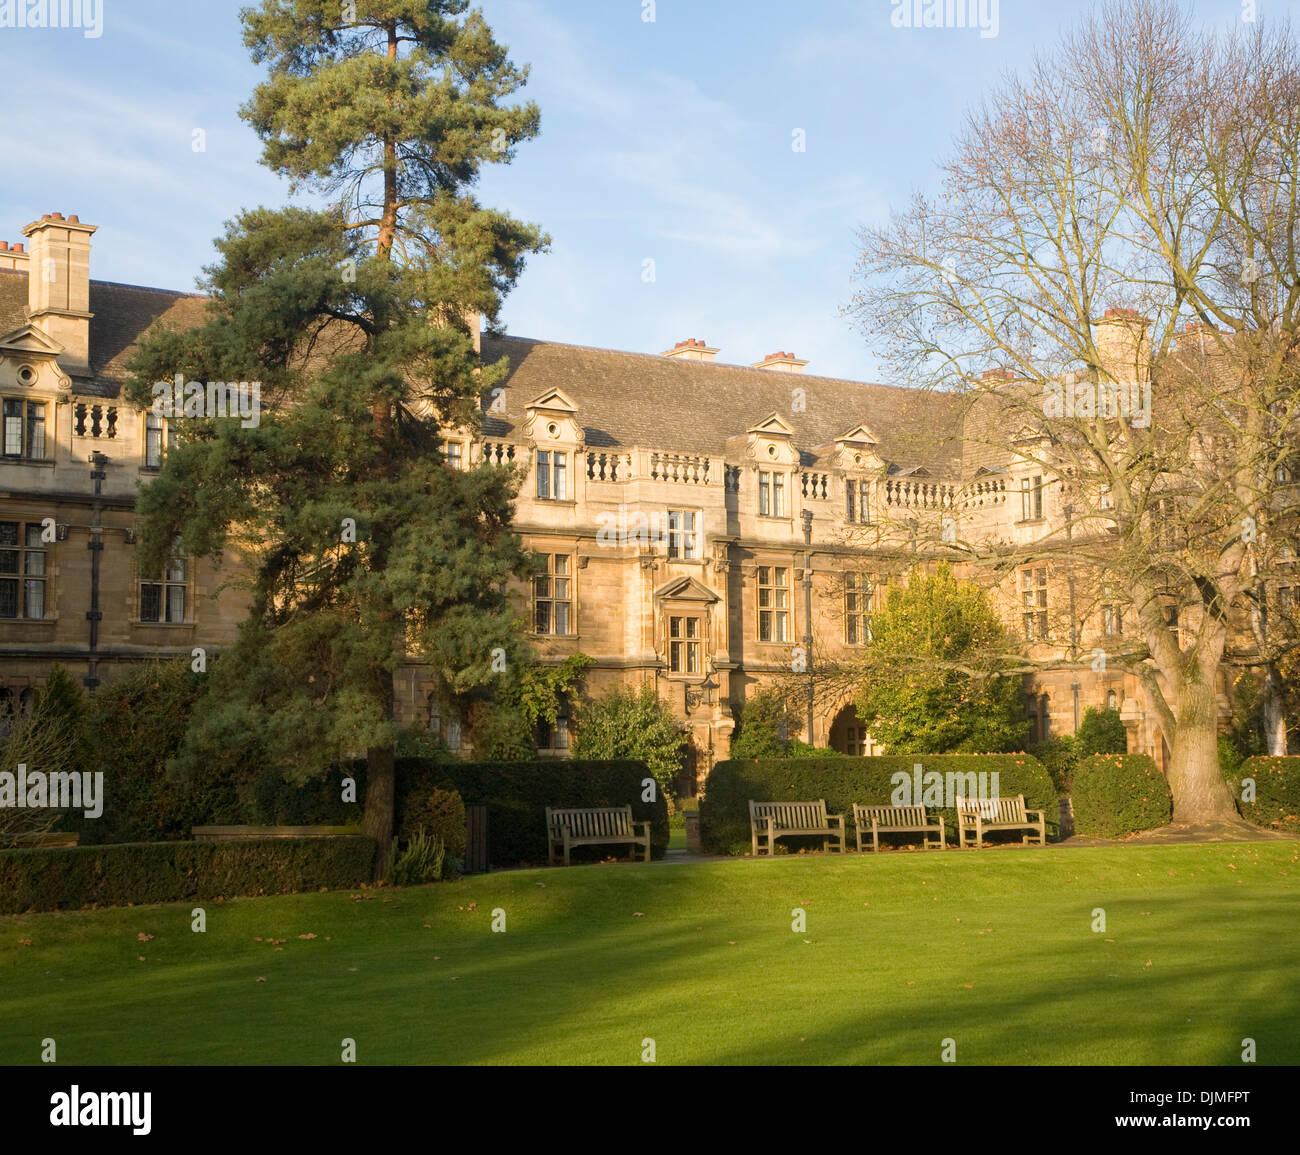 Pembroke College, University of Cambridge, England - Stock Image